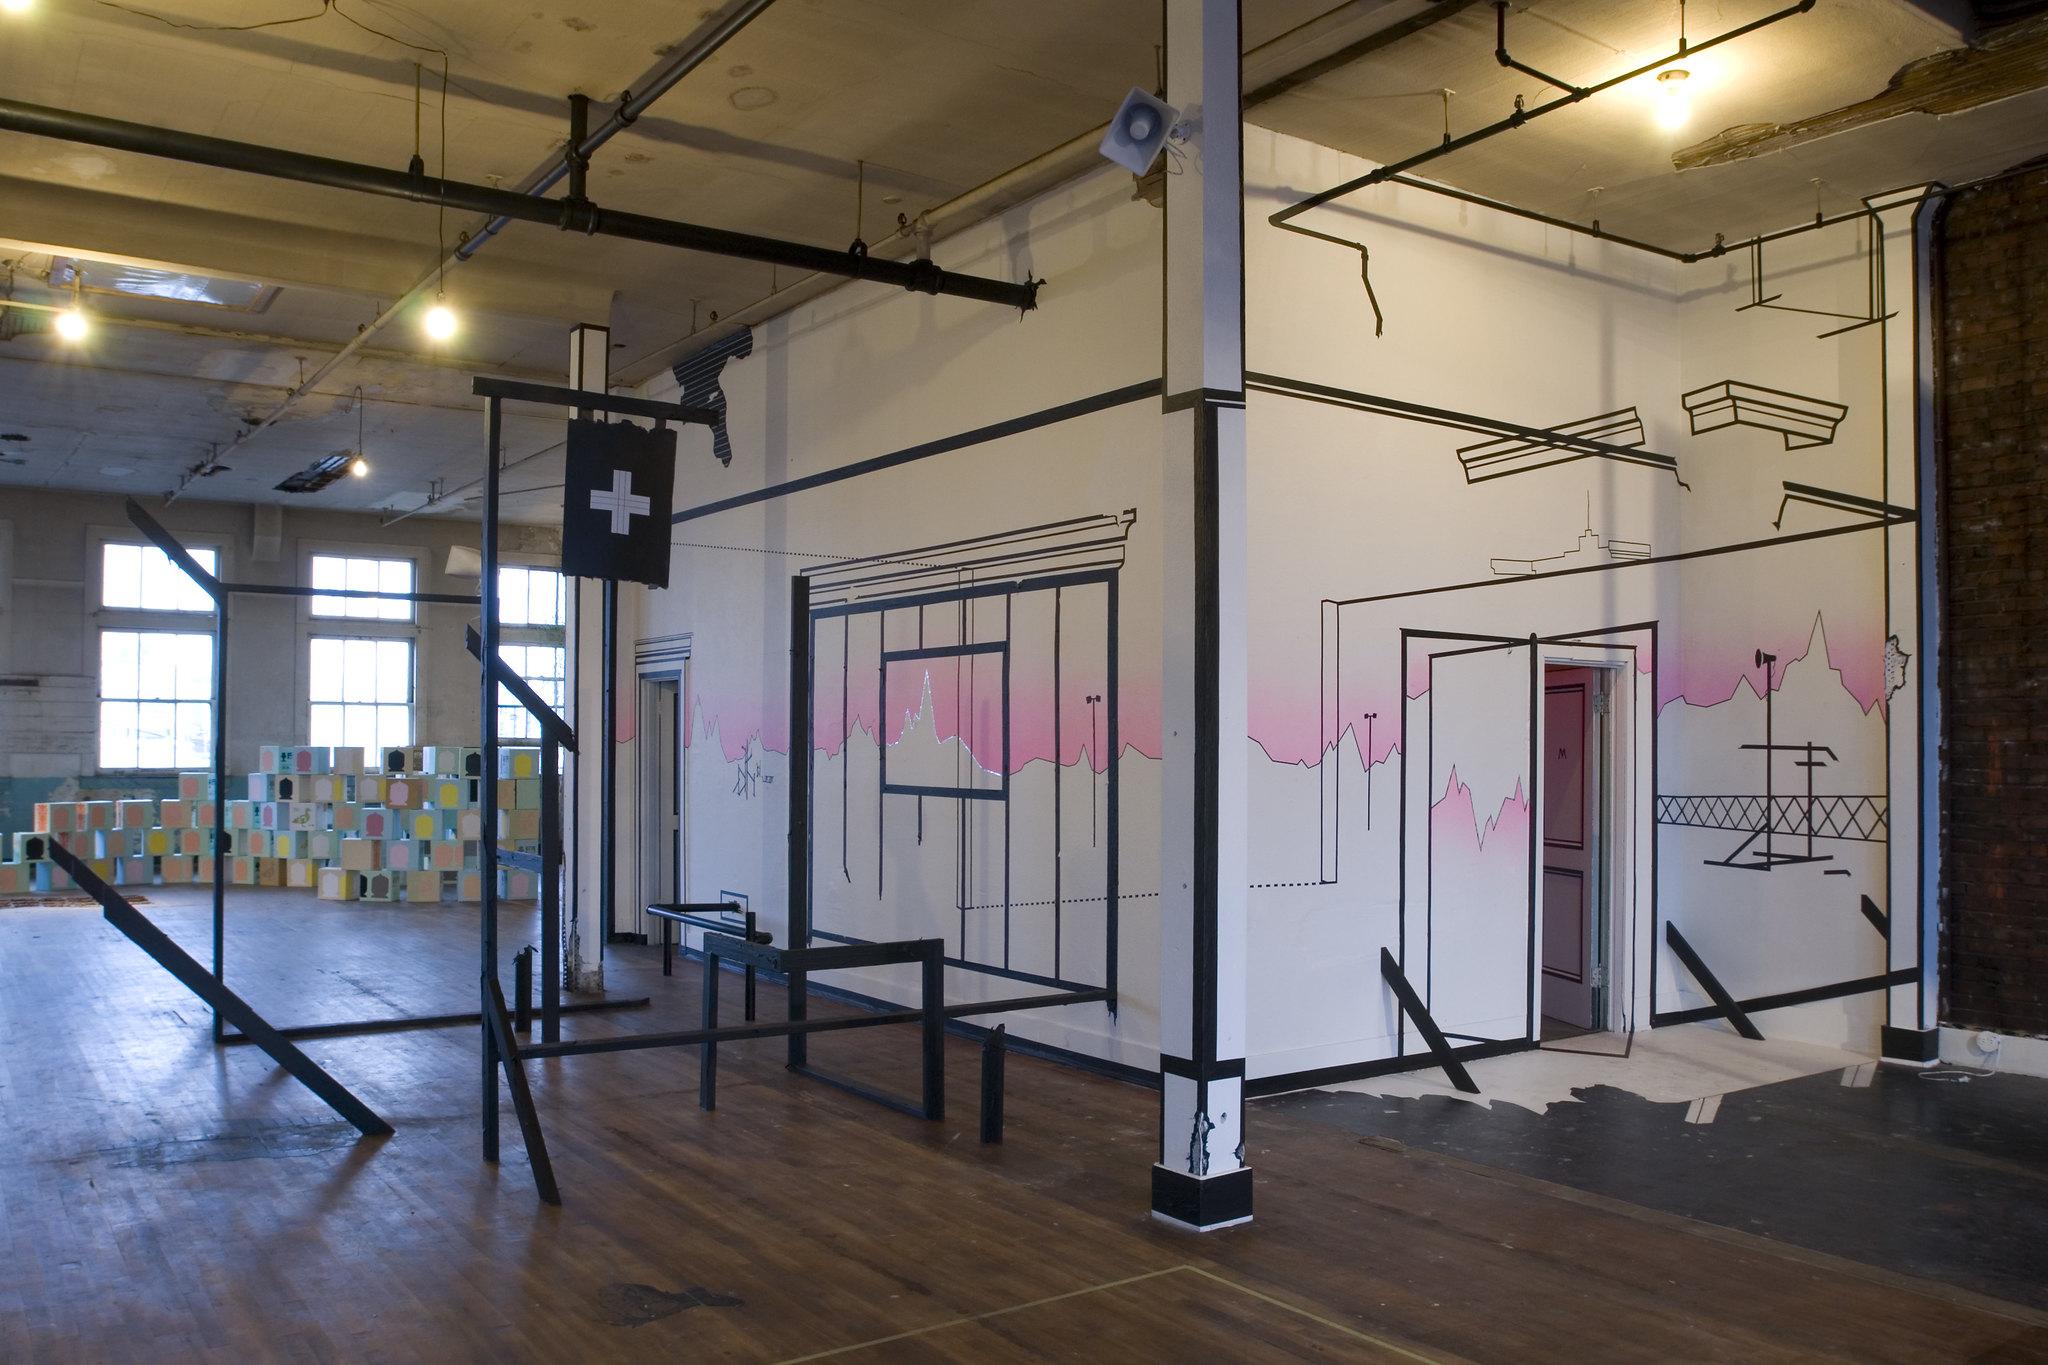 Damien Gilley Installation   Zero-Sum exhibited at the Templeton Building